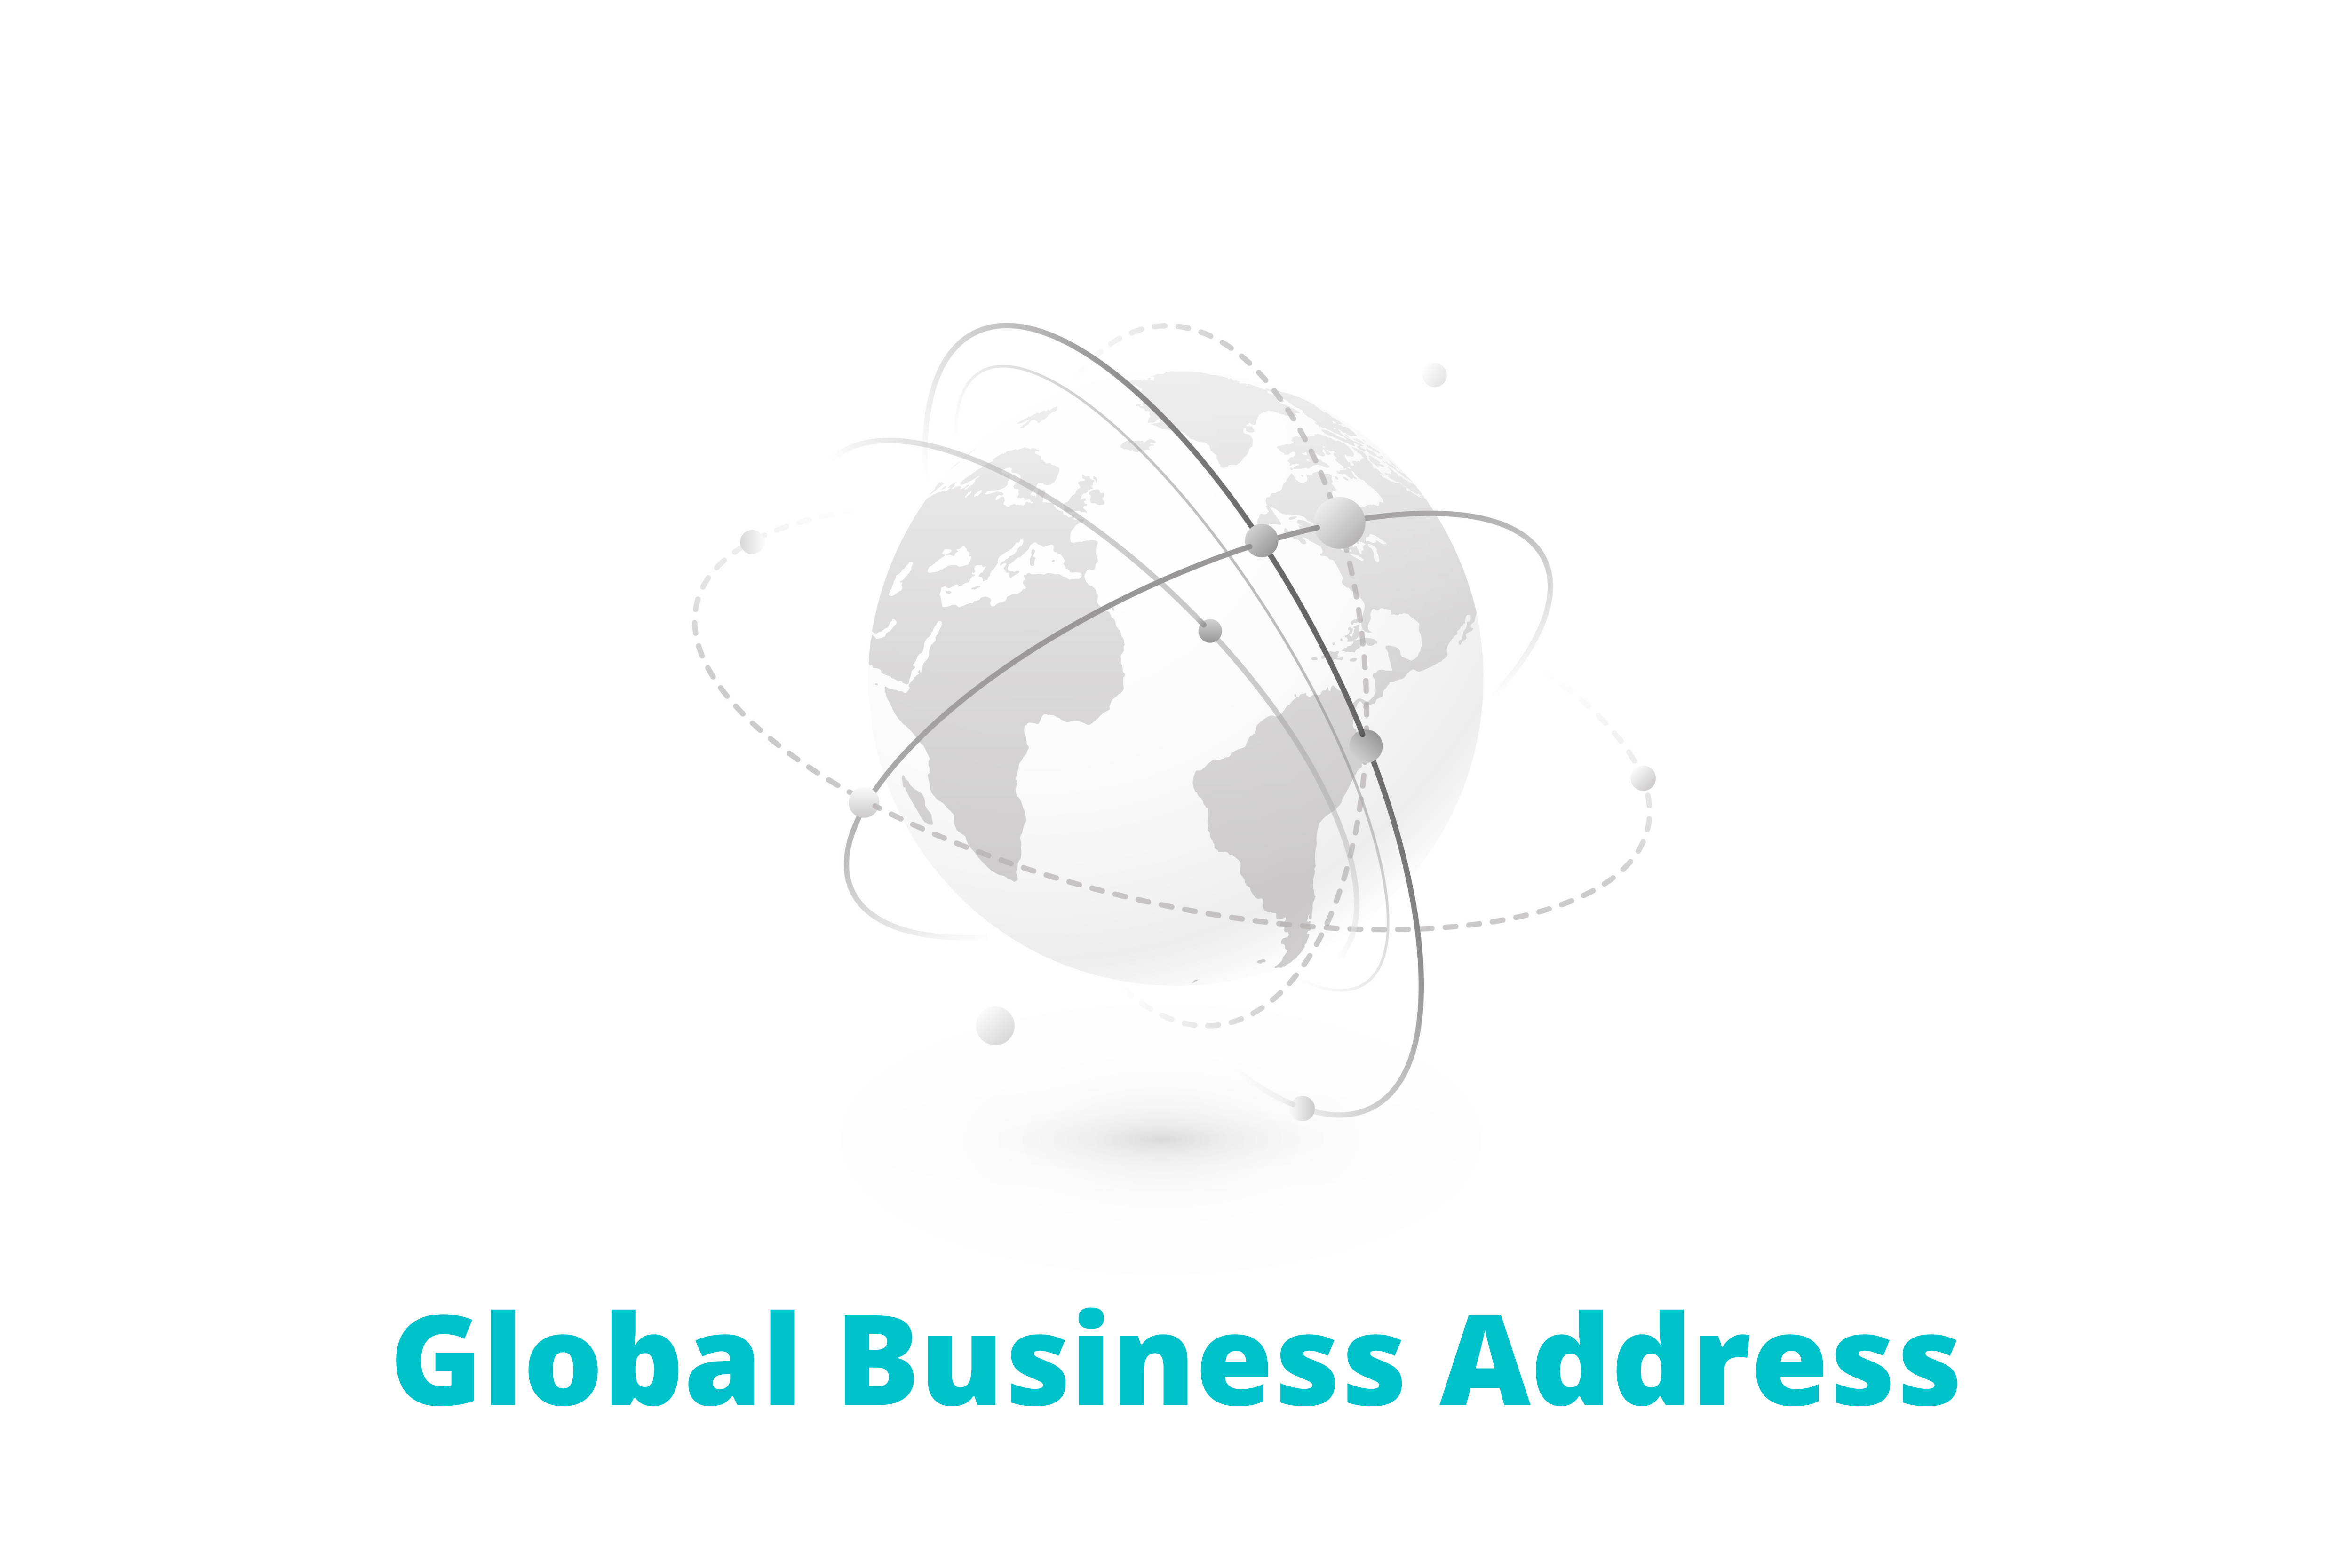 Global Business Address